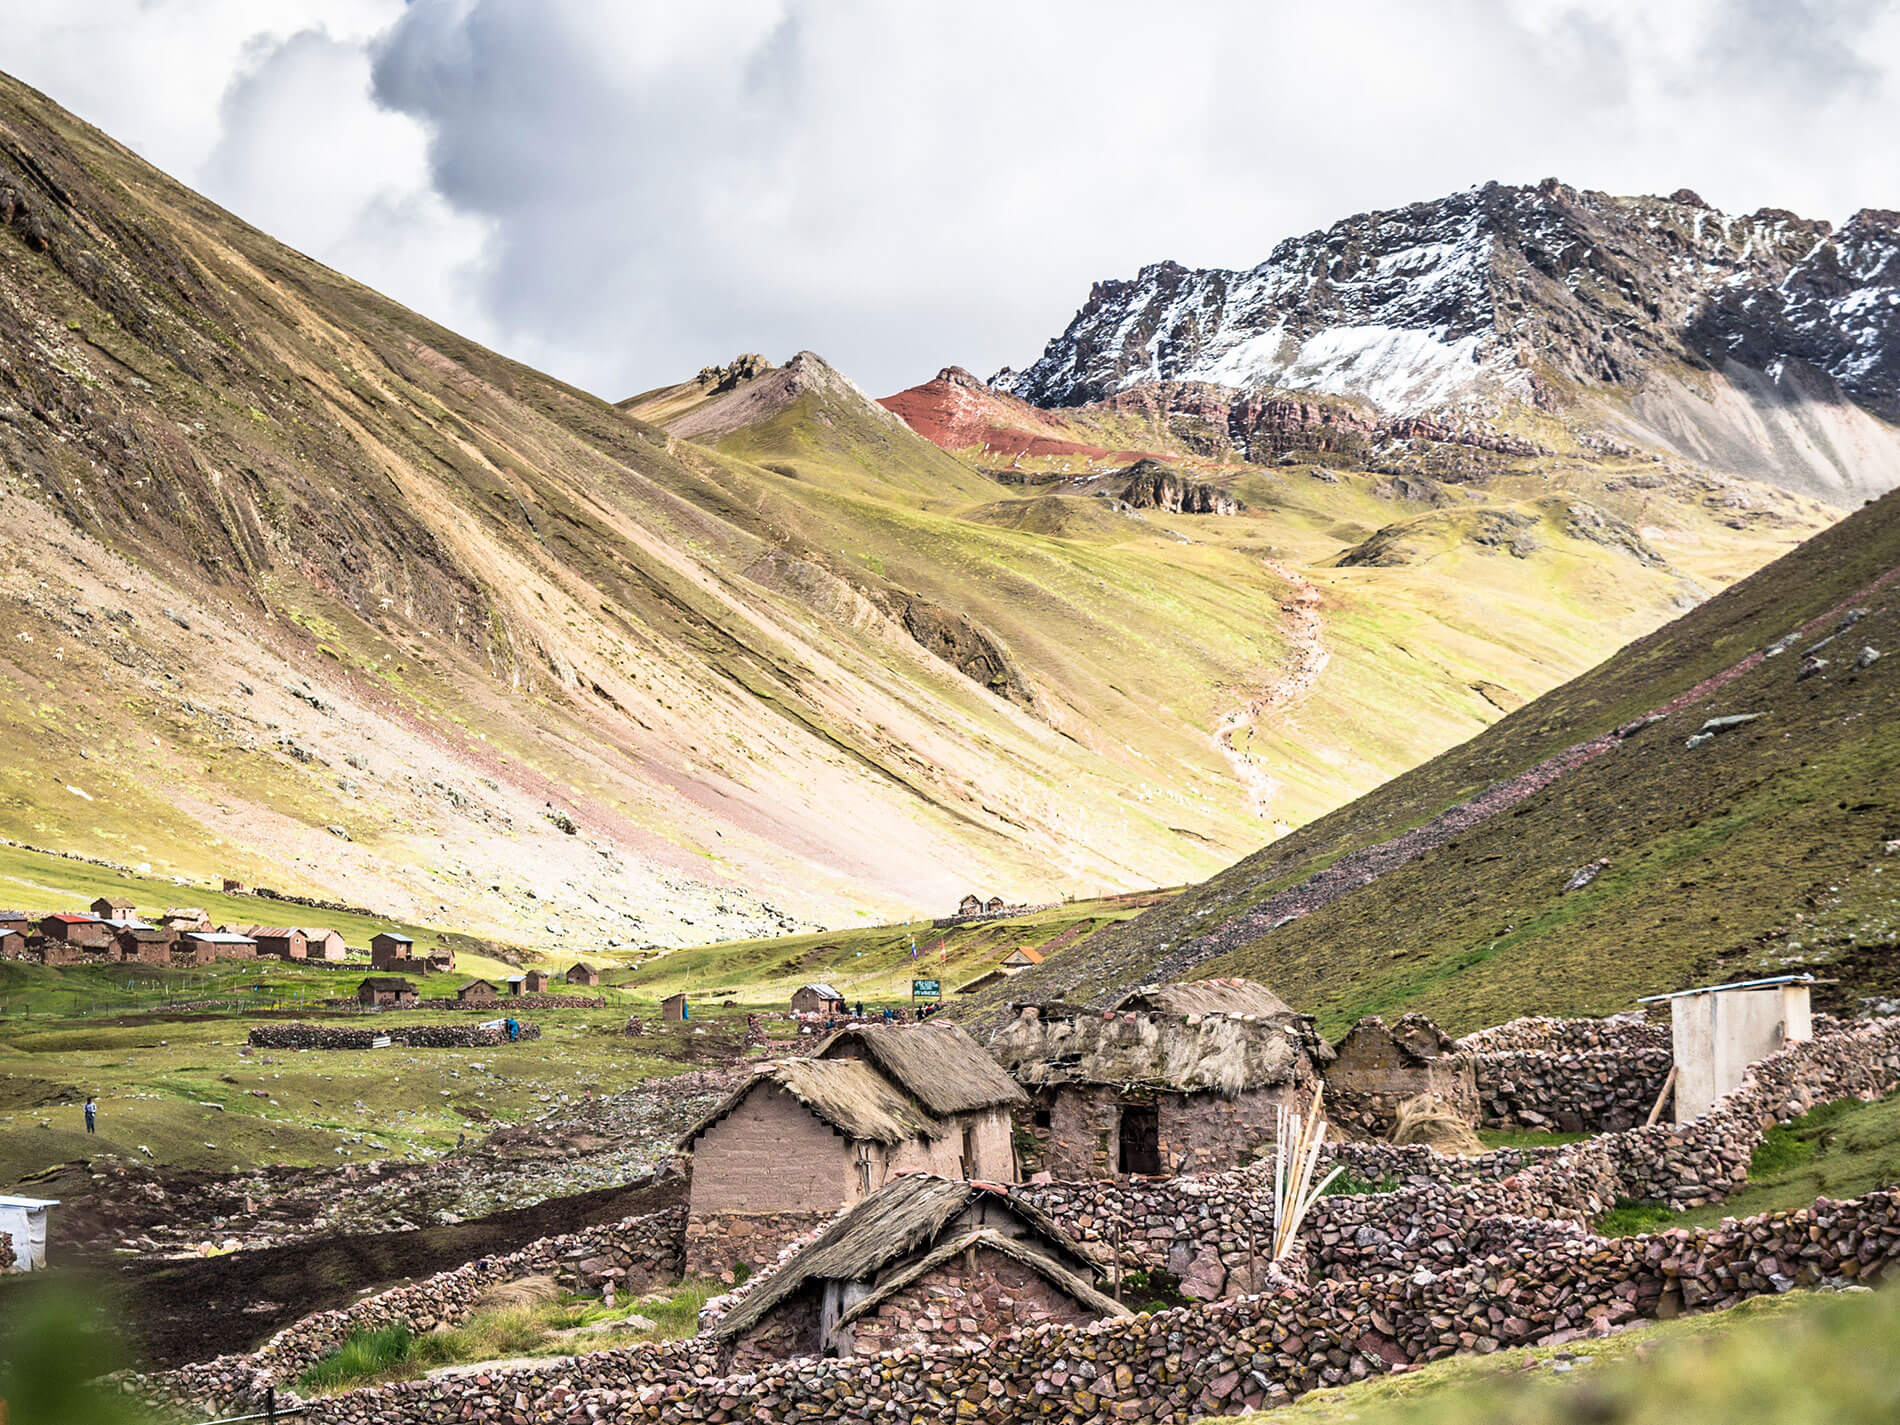 Rainbow Mountain Trek in Cusco via Ausangate Trail